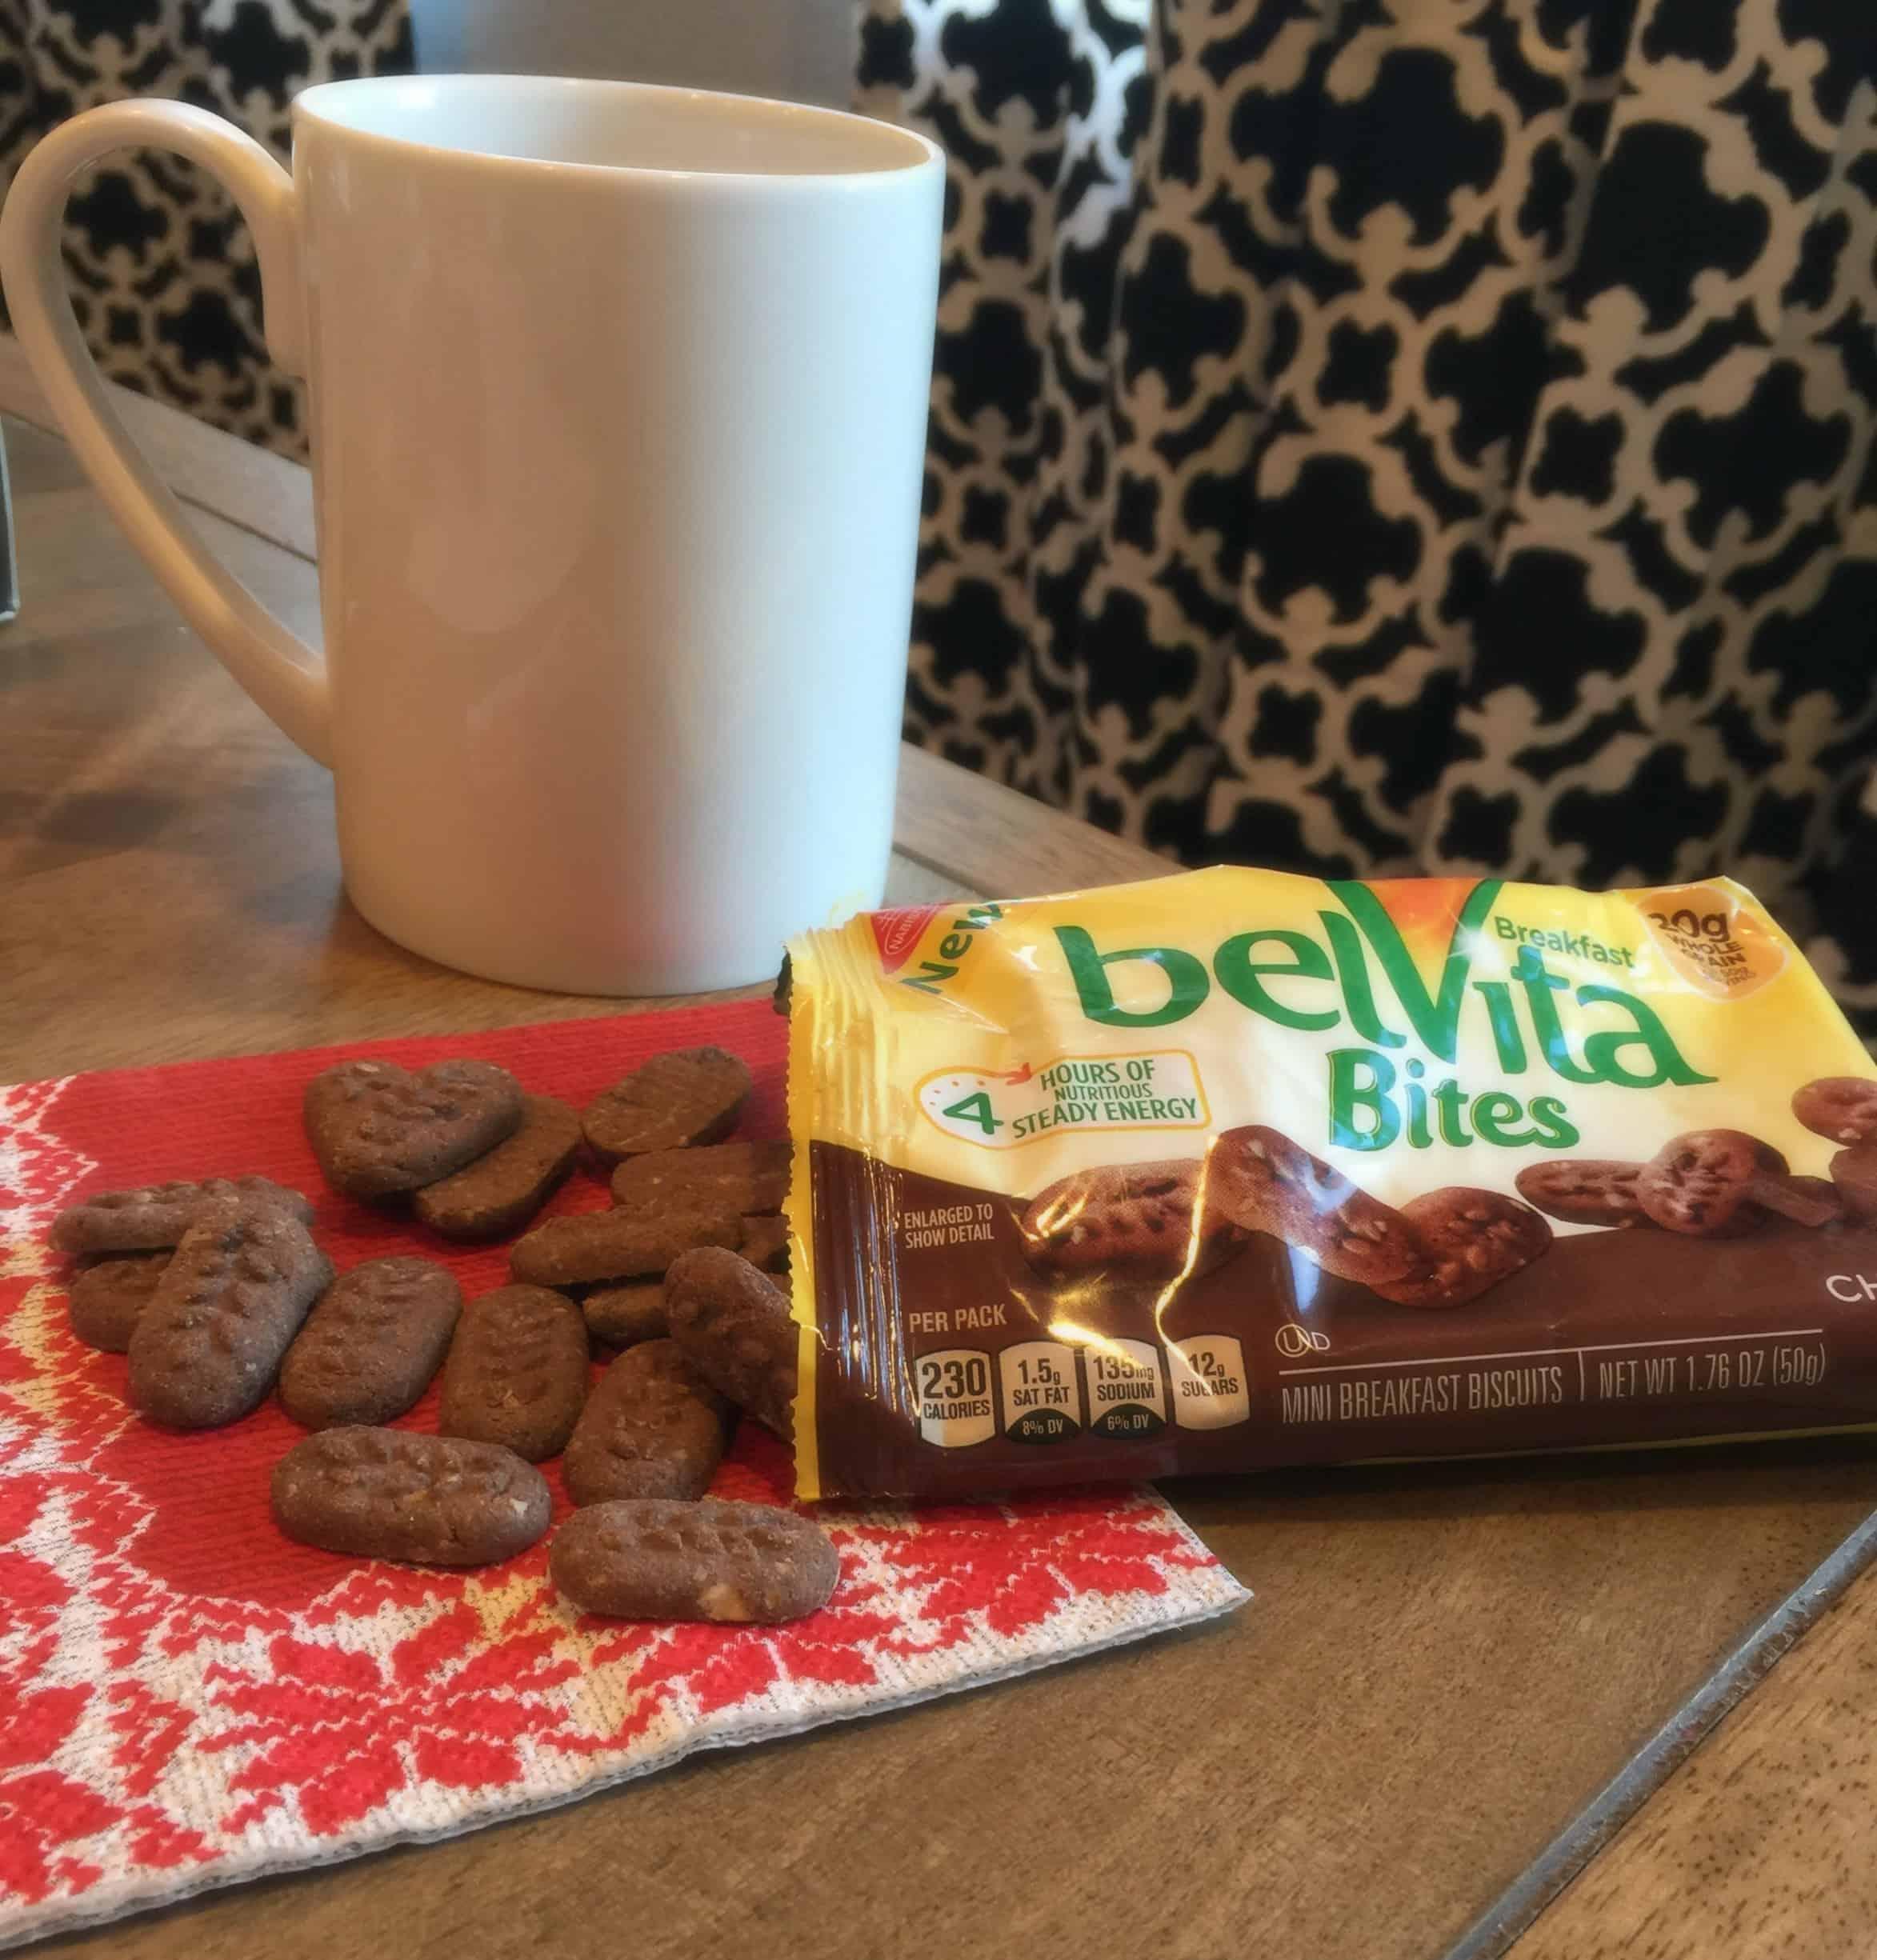 belVita Bites and coffee